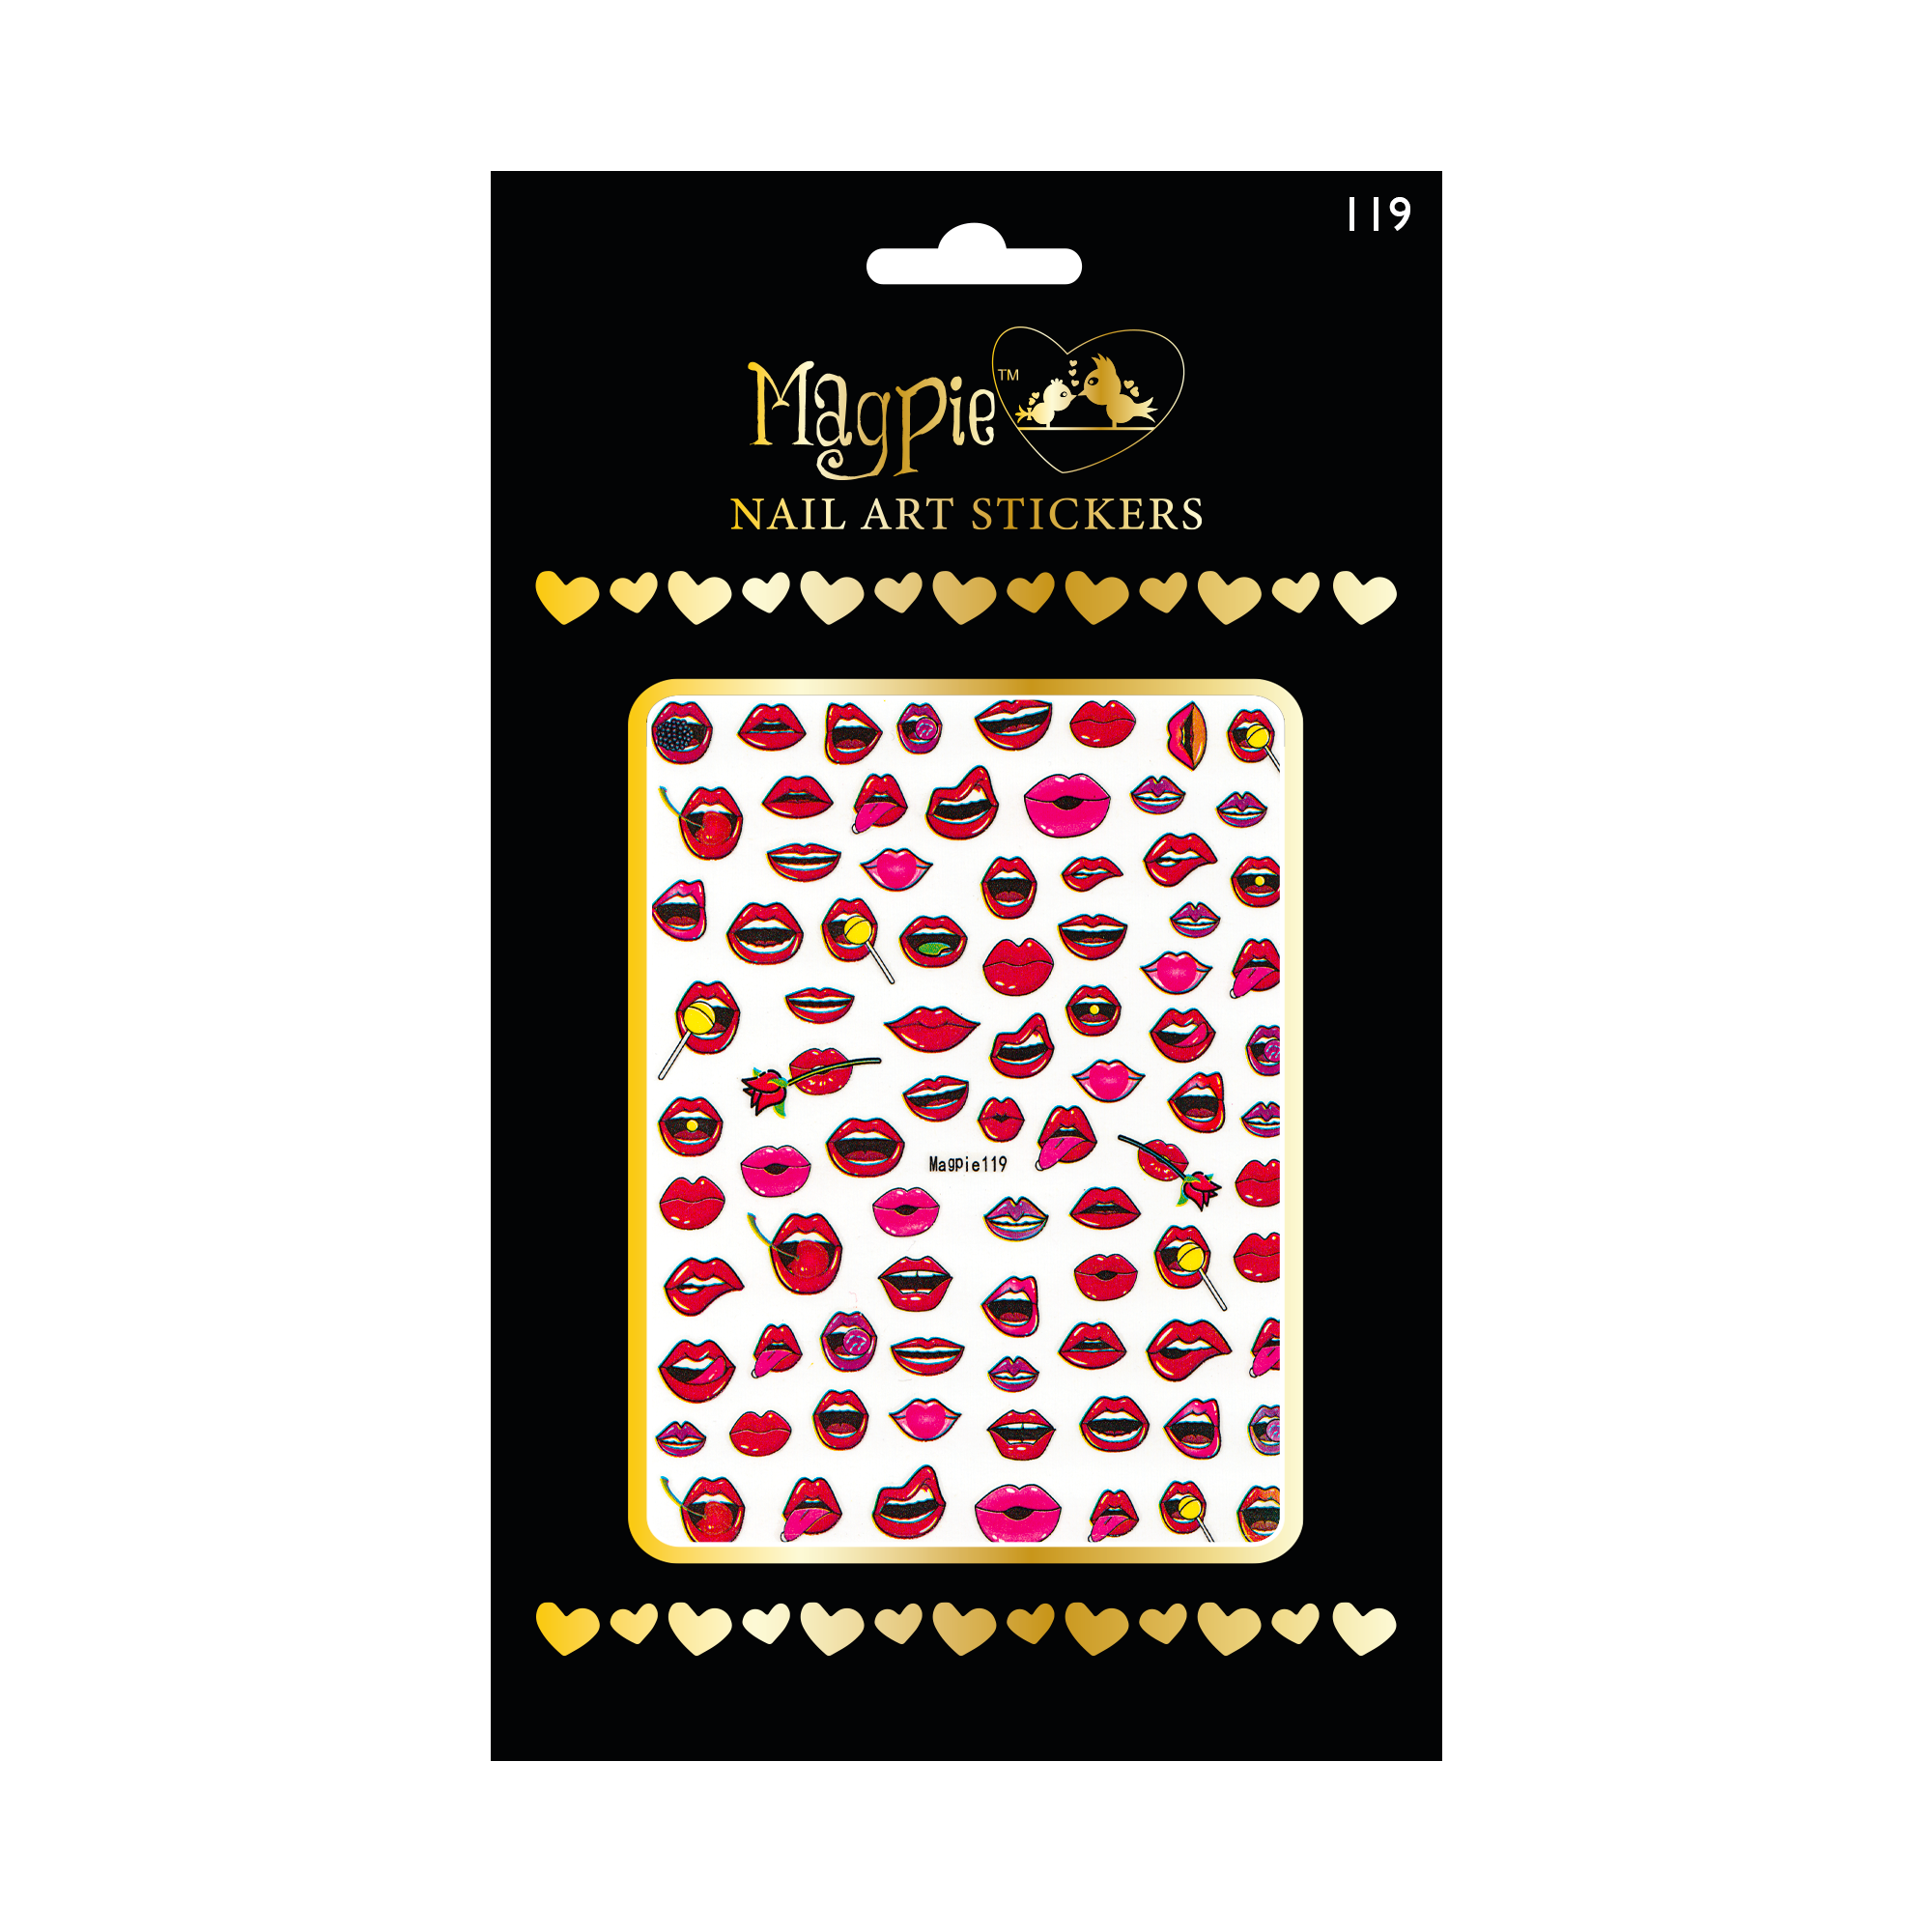 Magpie 119 stickers